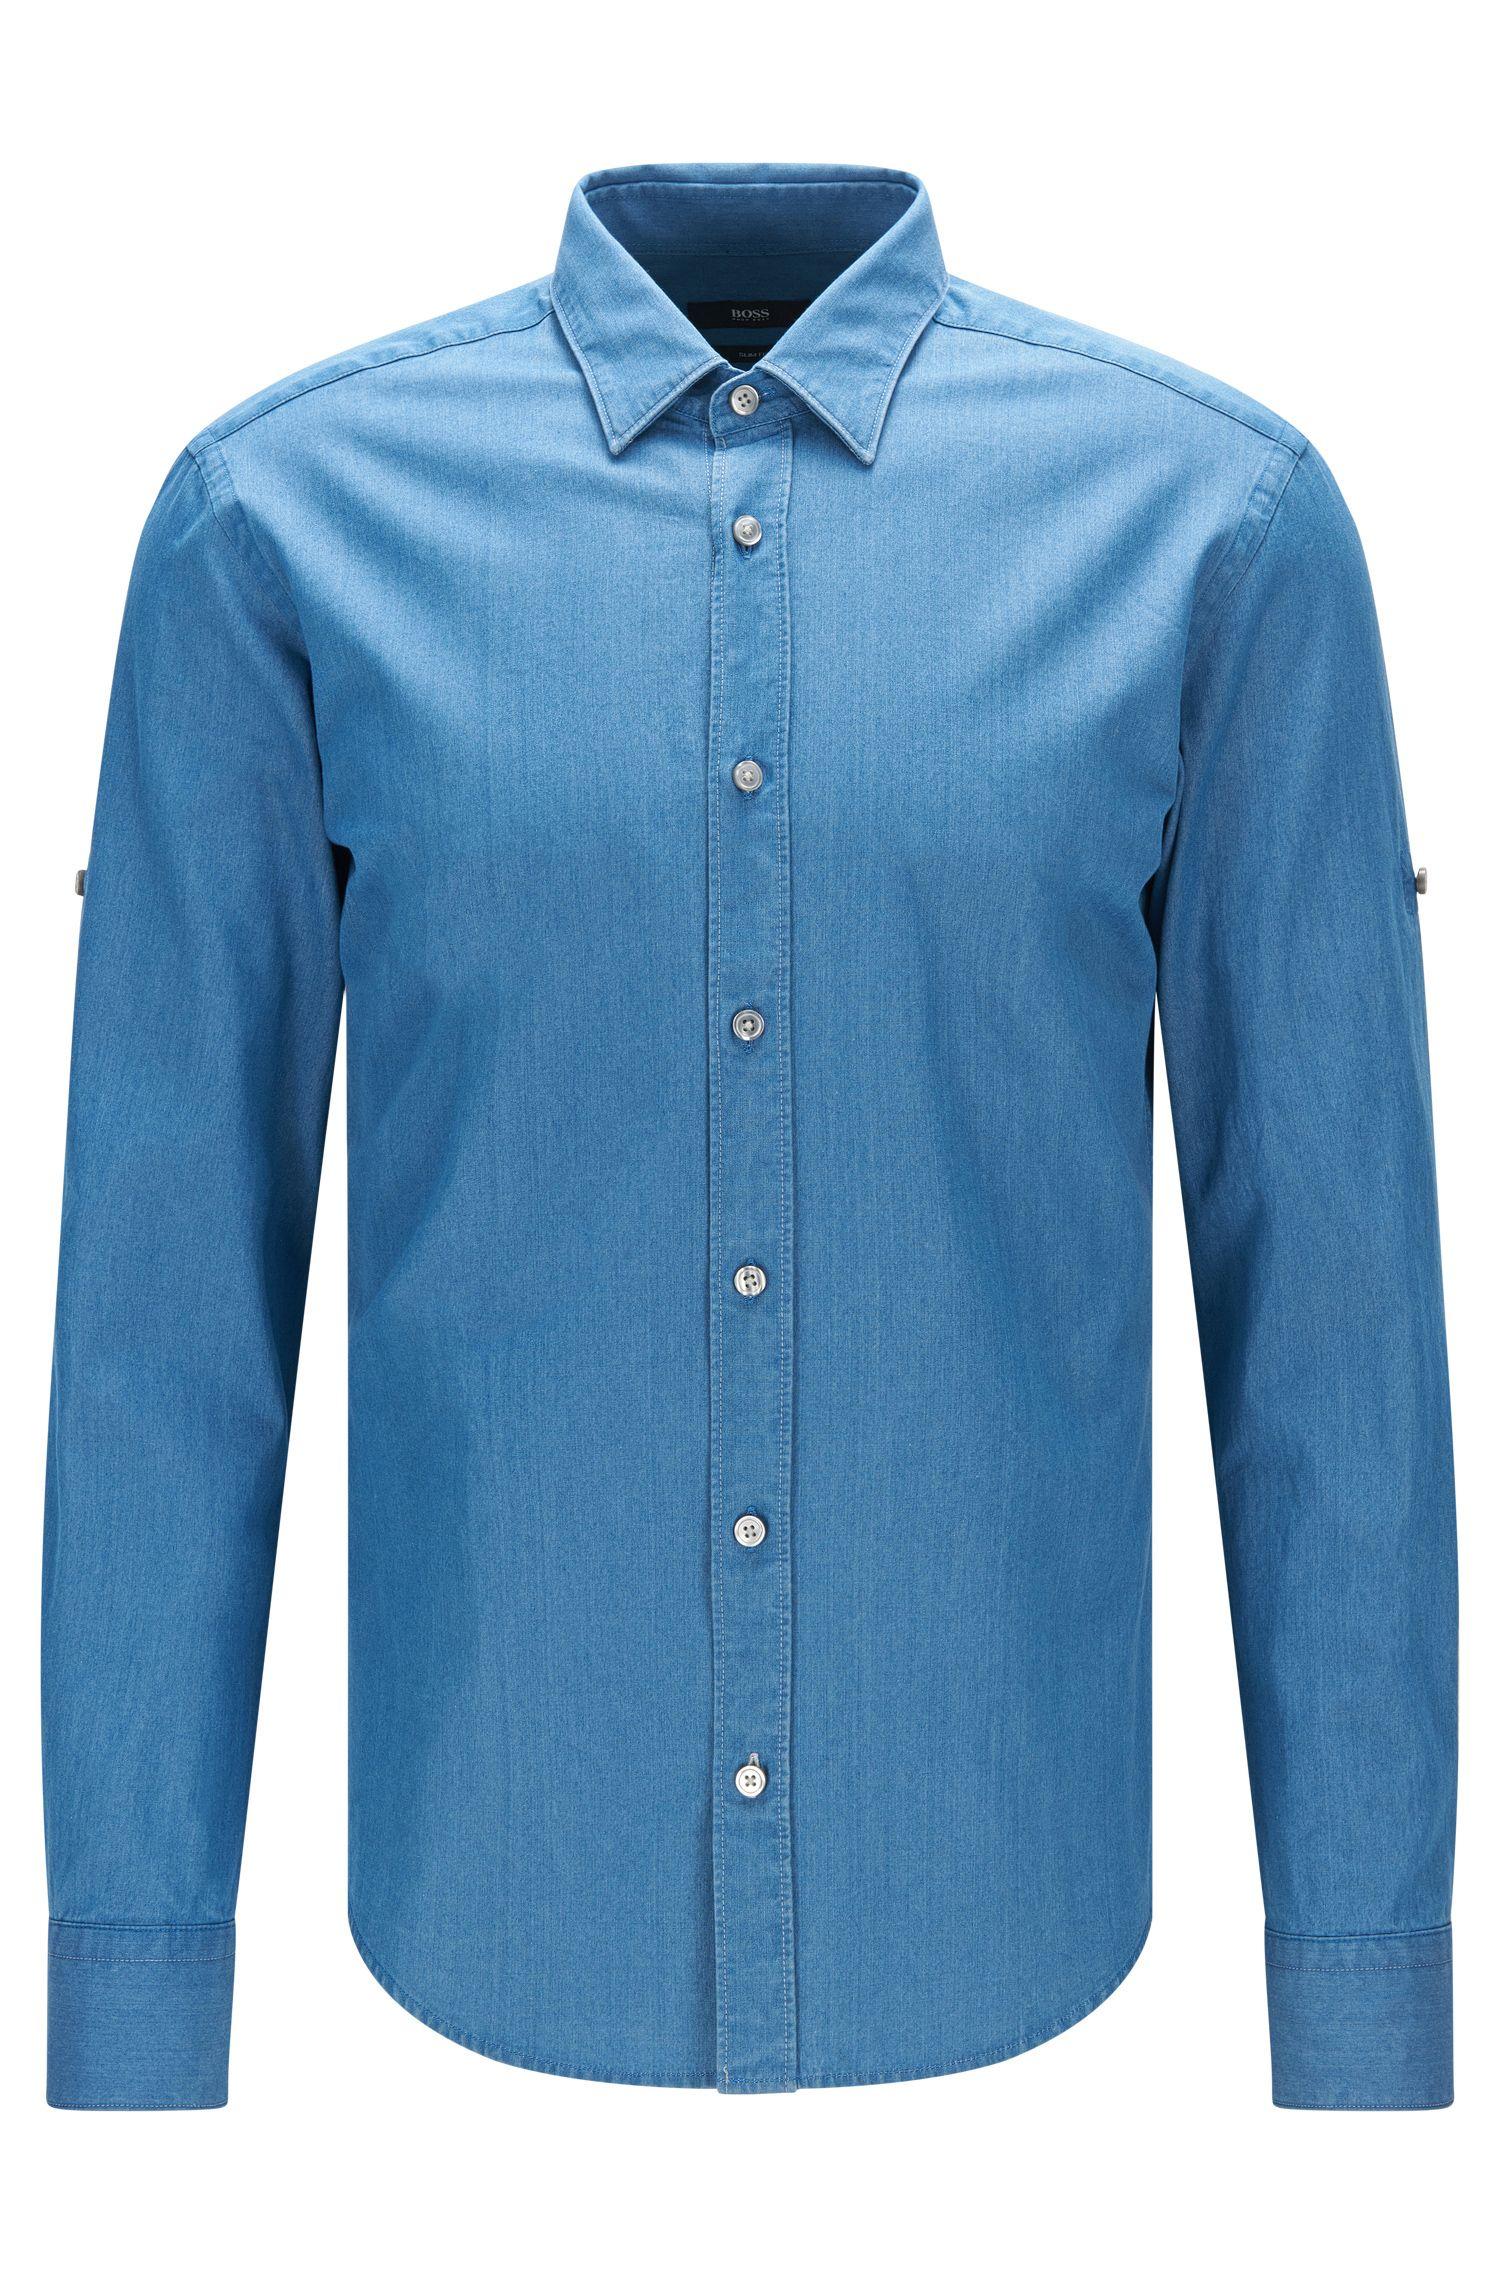 Chambray Cotton Button Down Shirt, Slim Fit | Reid